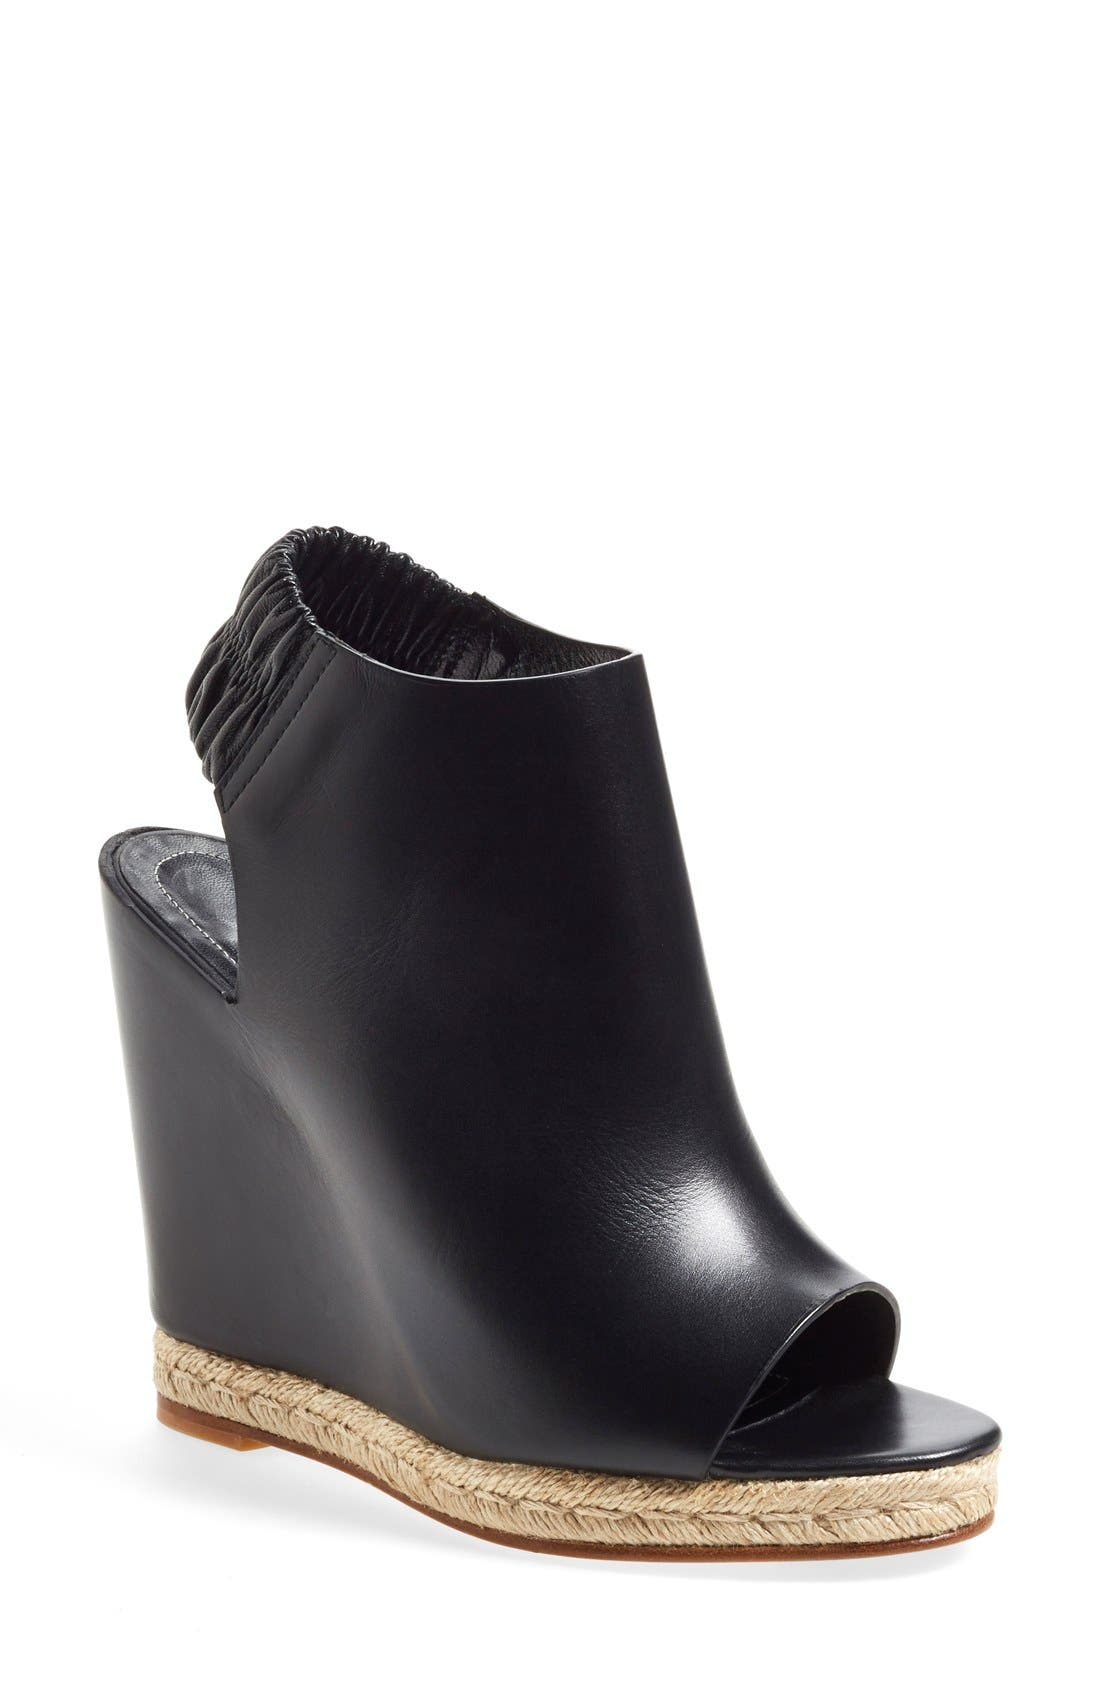 Main Image - Balenciaga Espadrille Wedge Sandal (Women)